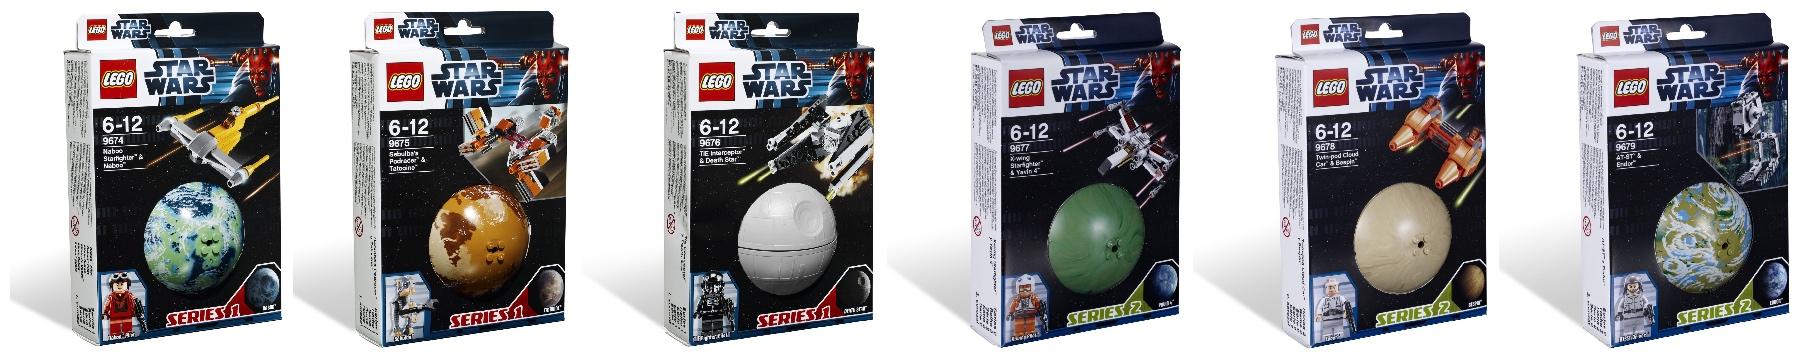 2012 LEGO Star Wars Planet Series